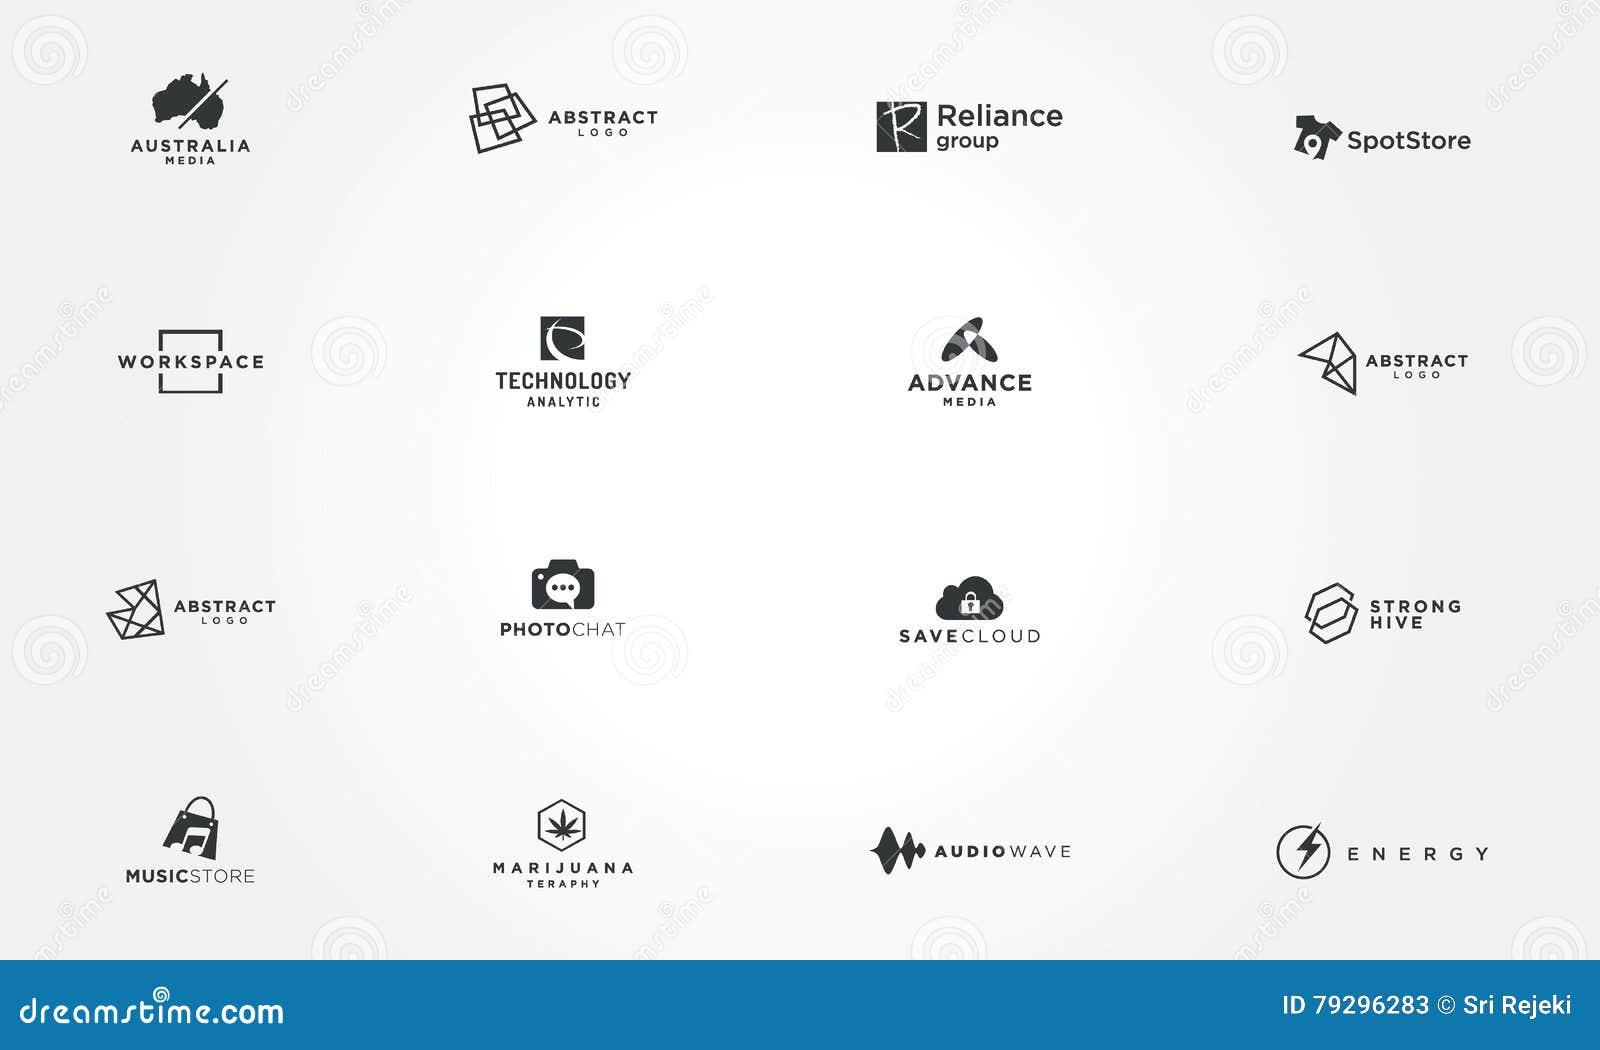 Free logo design australia